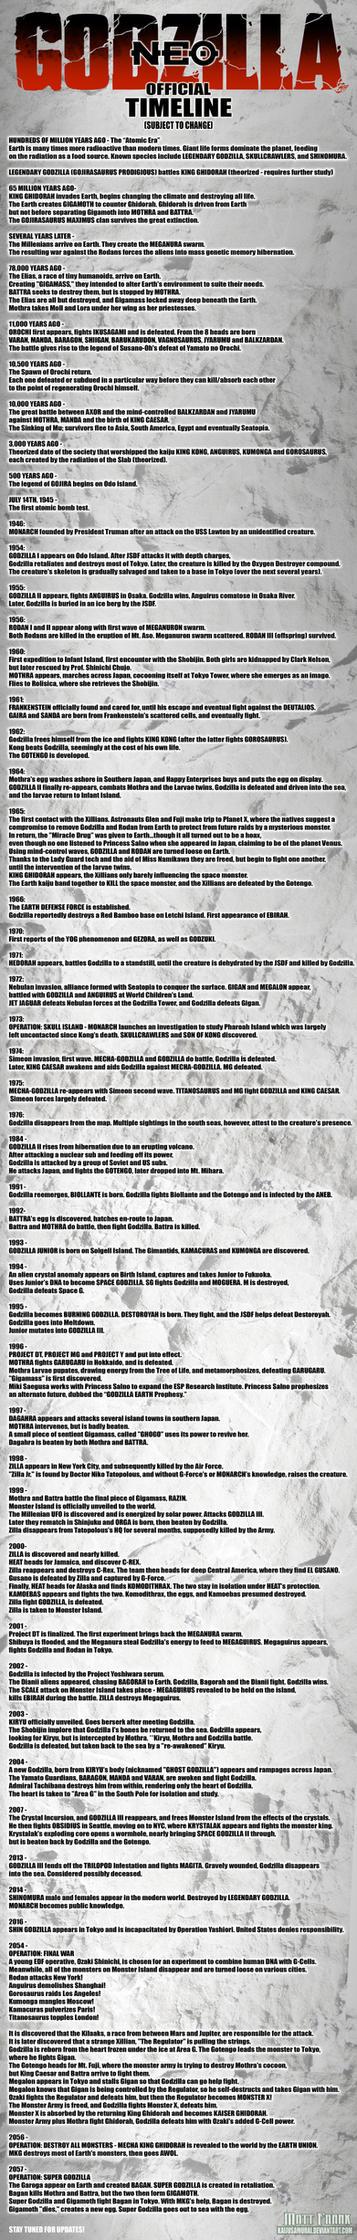 Godzilla Neo - OFFICIAL TIMELINE by KaijuSamurai